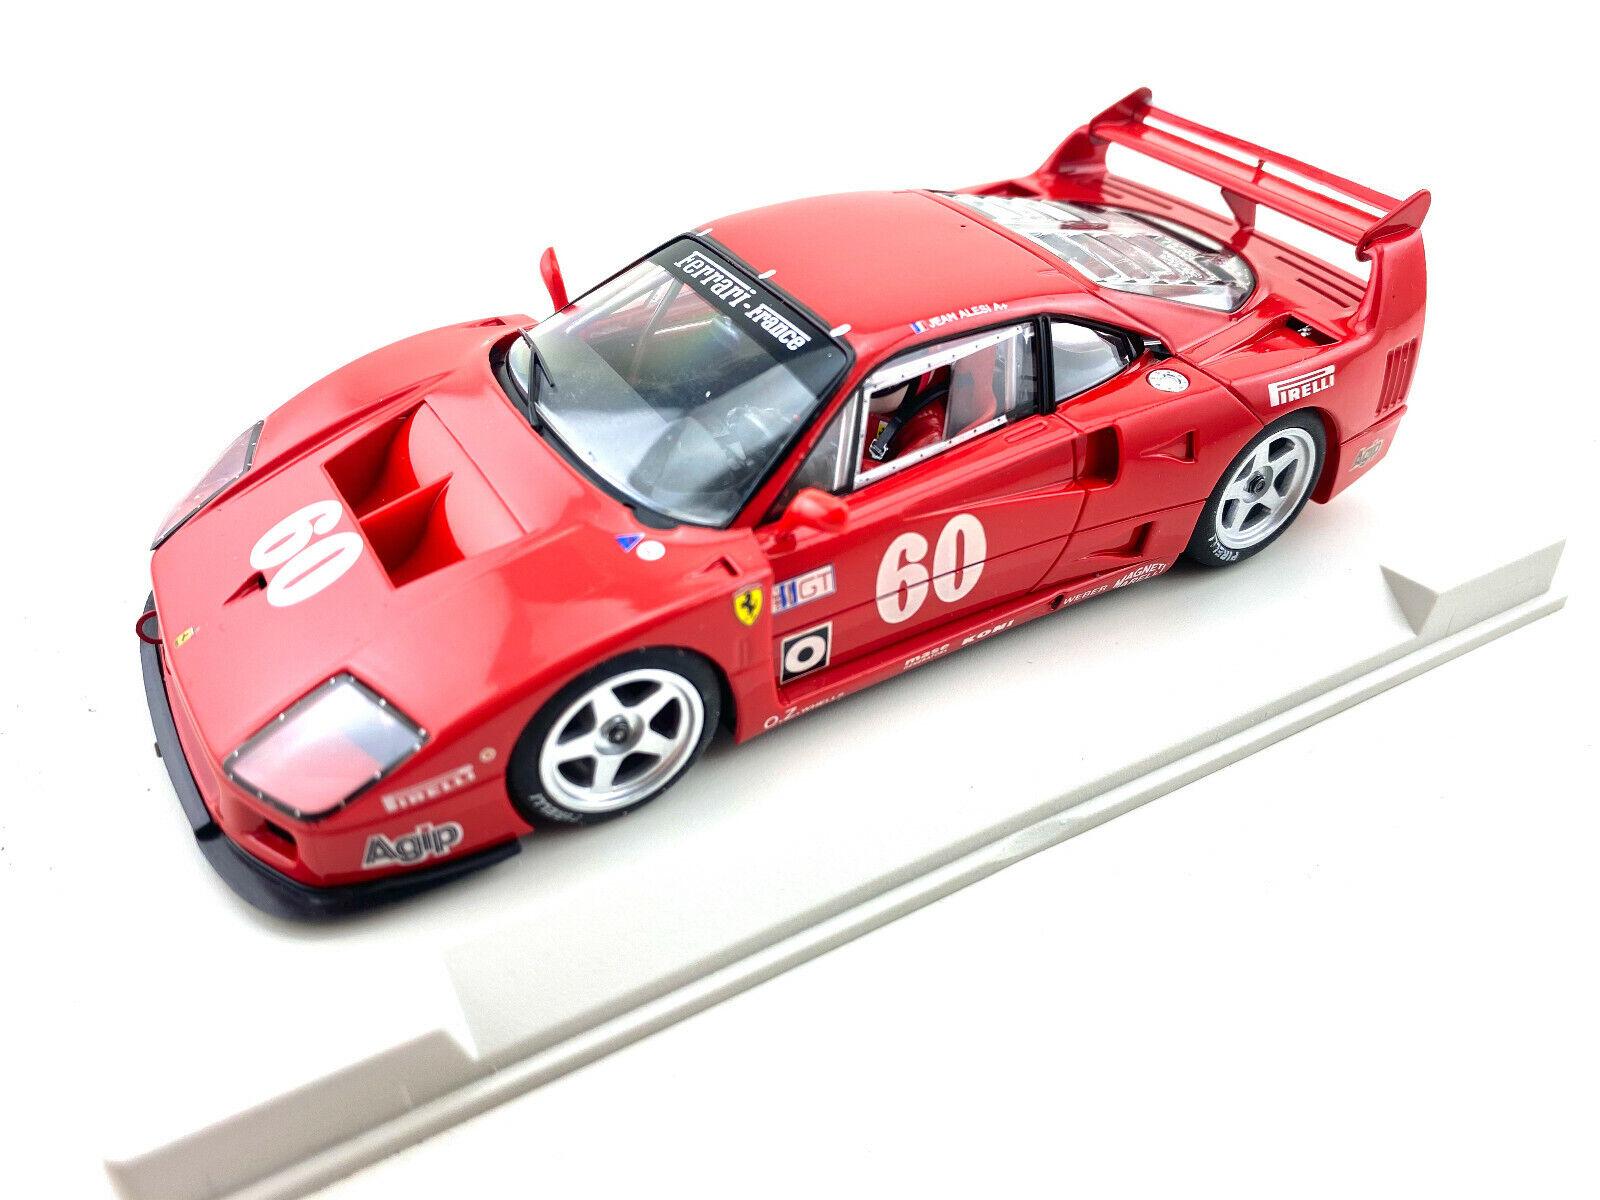 Imagen 1 - Fly-Car-Model-Ferrari-F40-IMSA-Laguna-Seca-1989-Jean-Alesi-1-32-Slot-Car